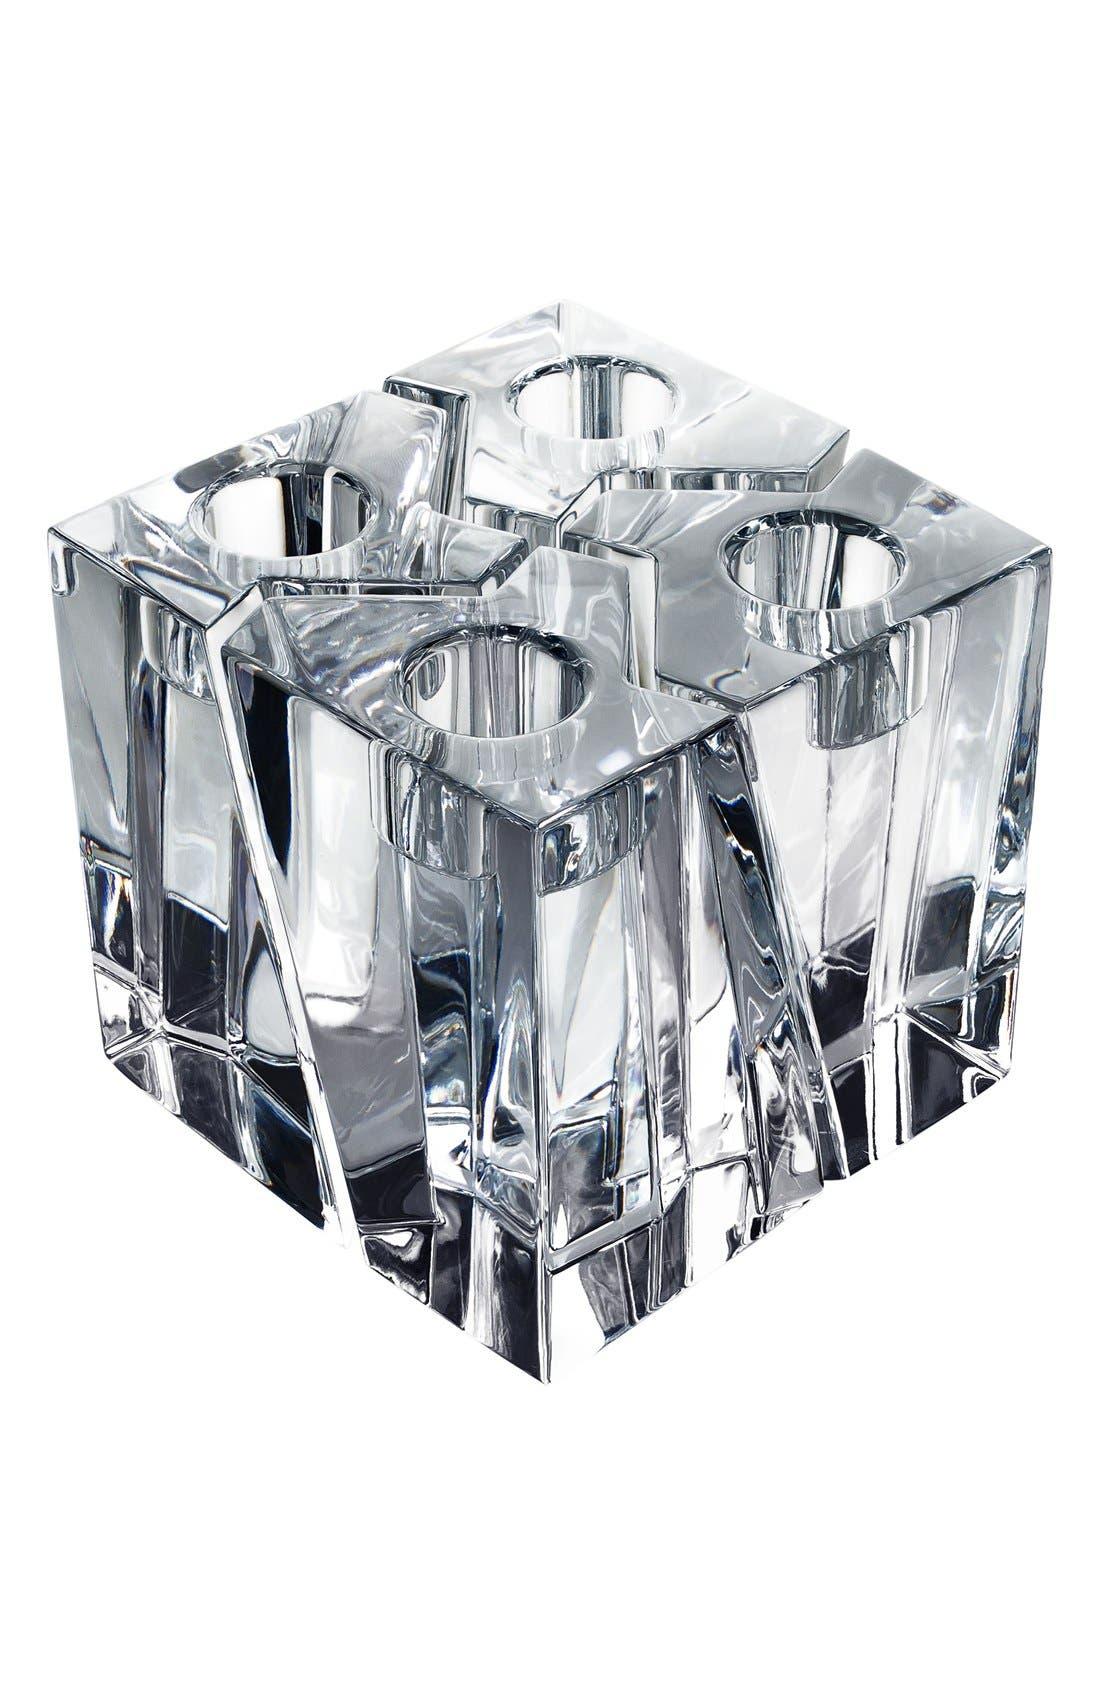 Main Image - Orrefors'Klone' Square Crystal Candlestick Holders (Set of 4)